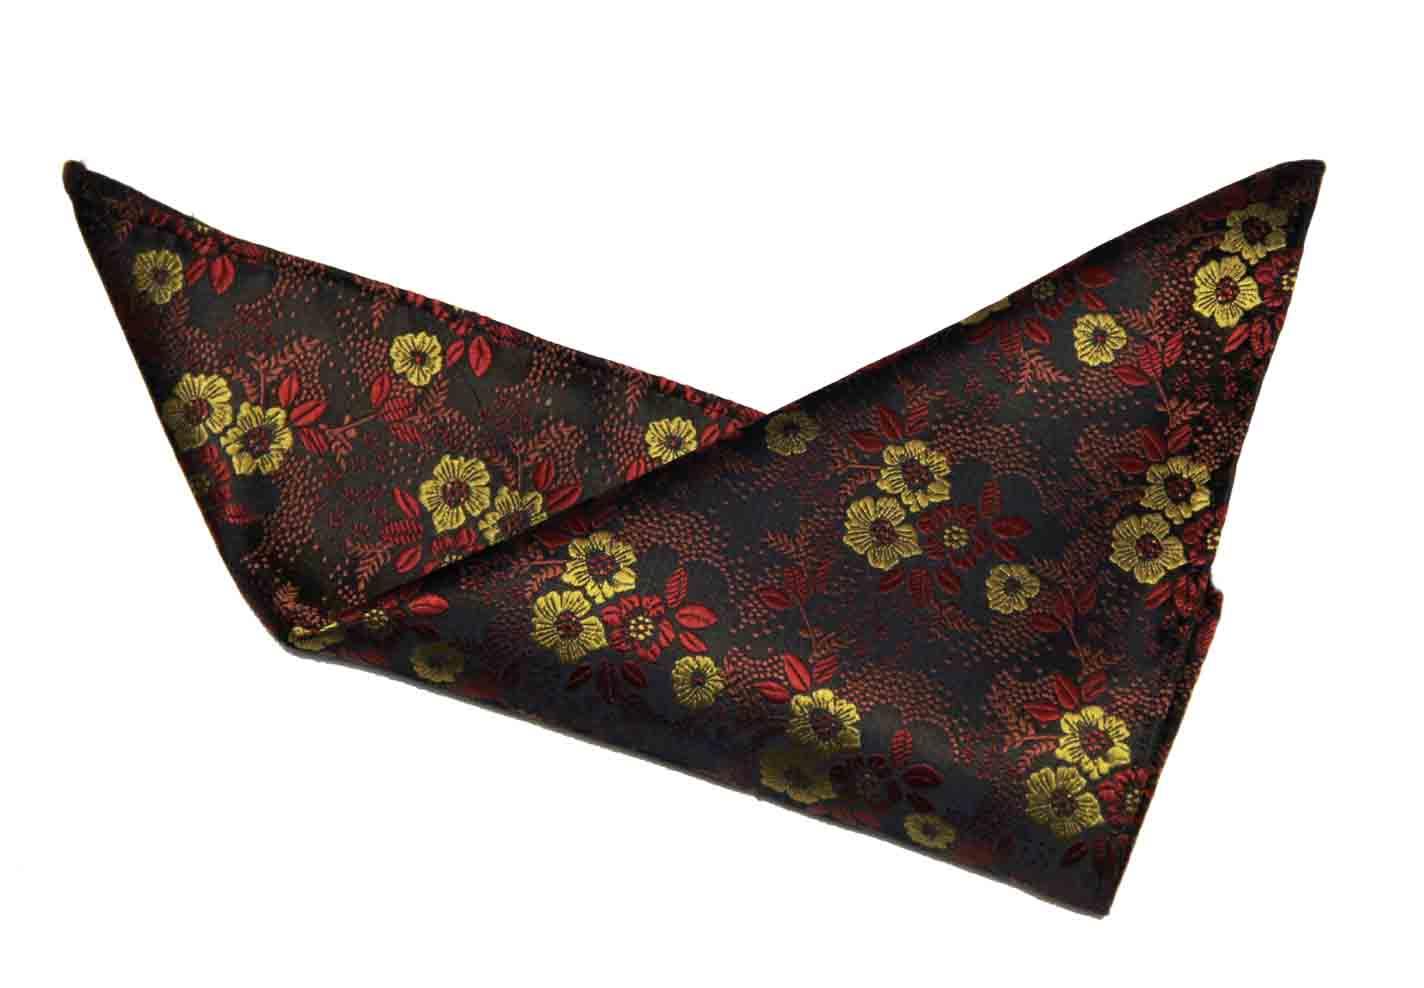 Gascoigne Silk Pocket Square Floral Red Gold Black Men's